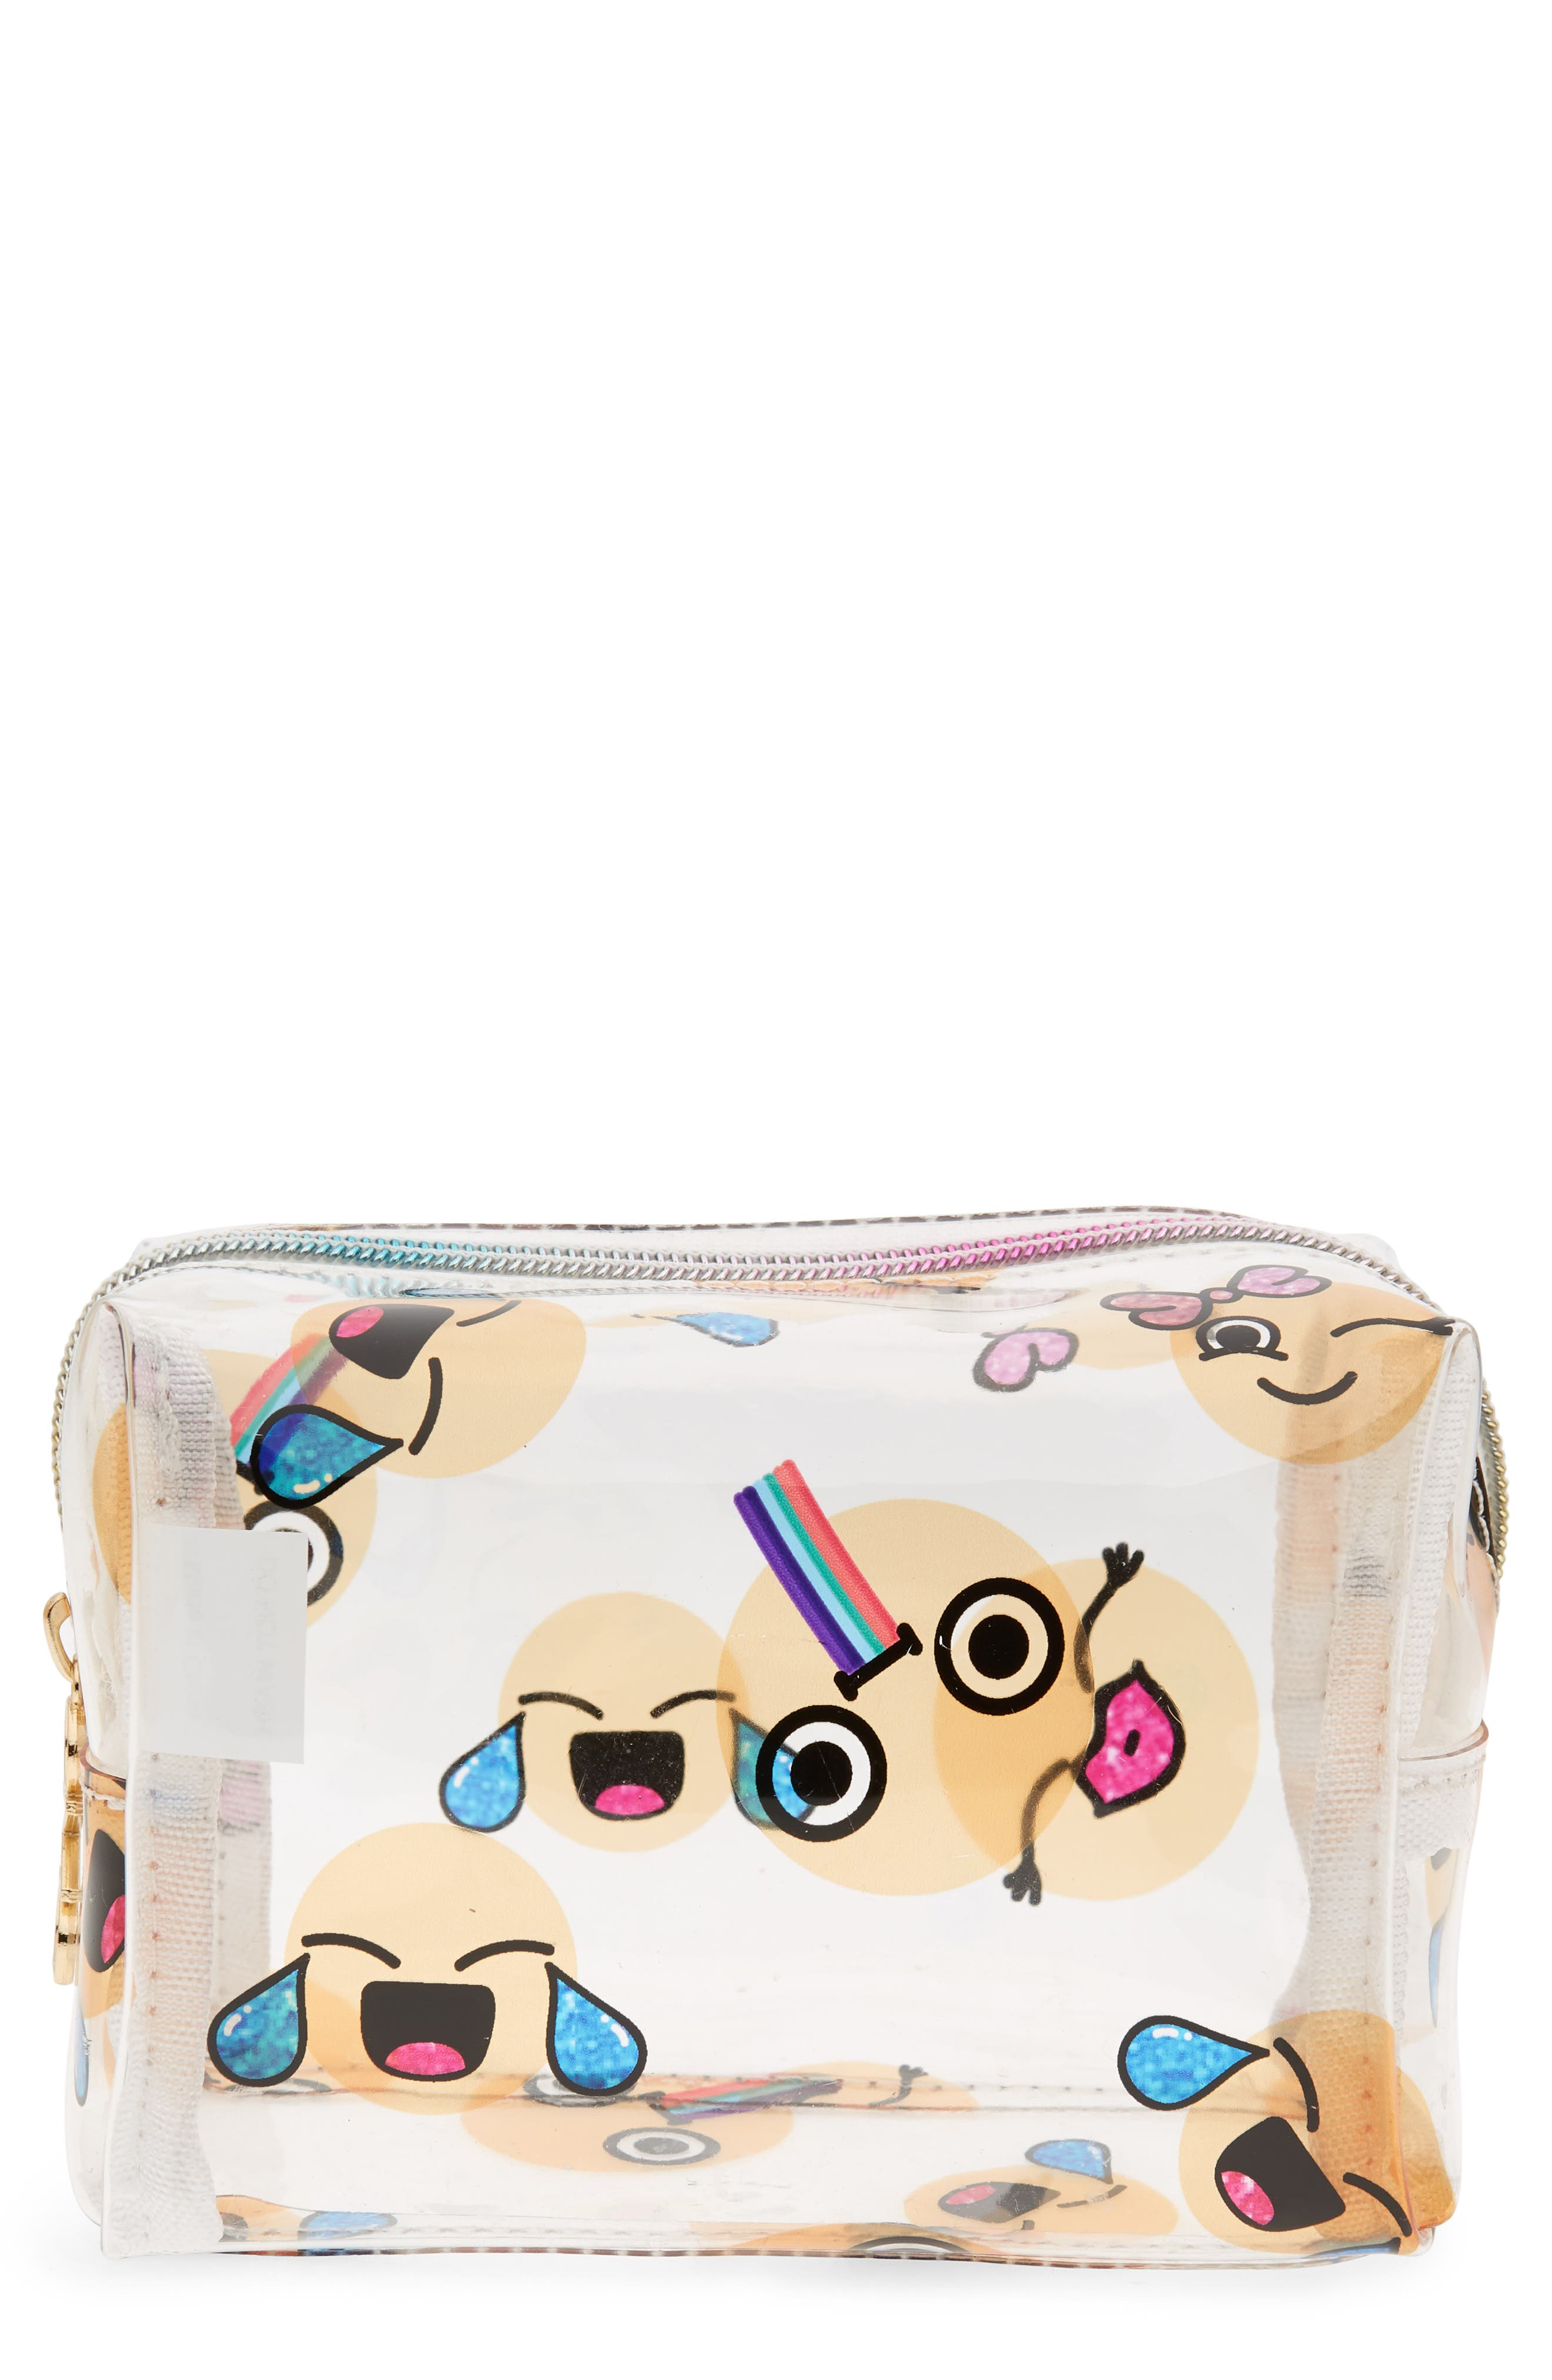 Emoji Cosmetics Case,                             Main thumbnail 1, color,                             100